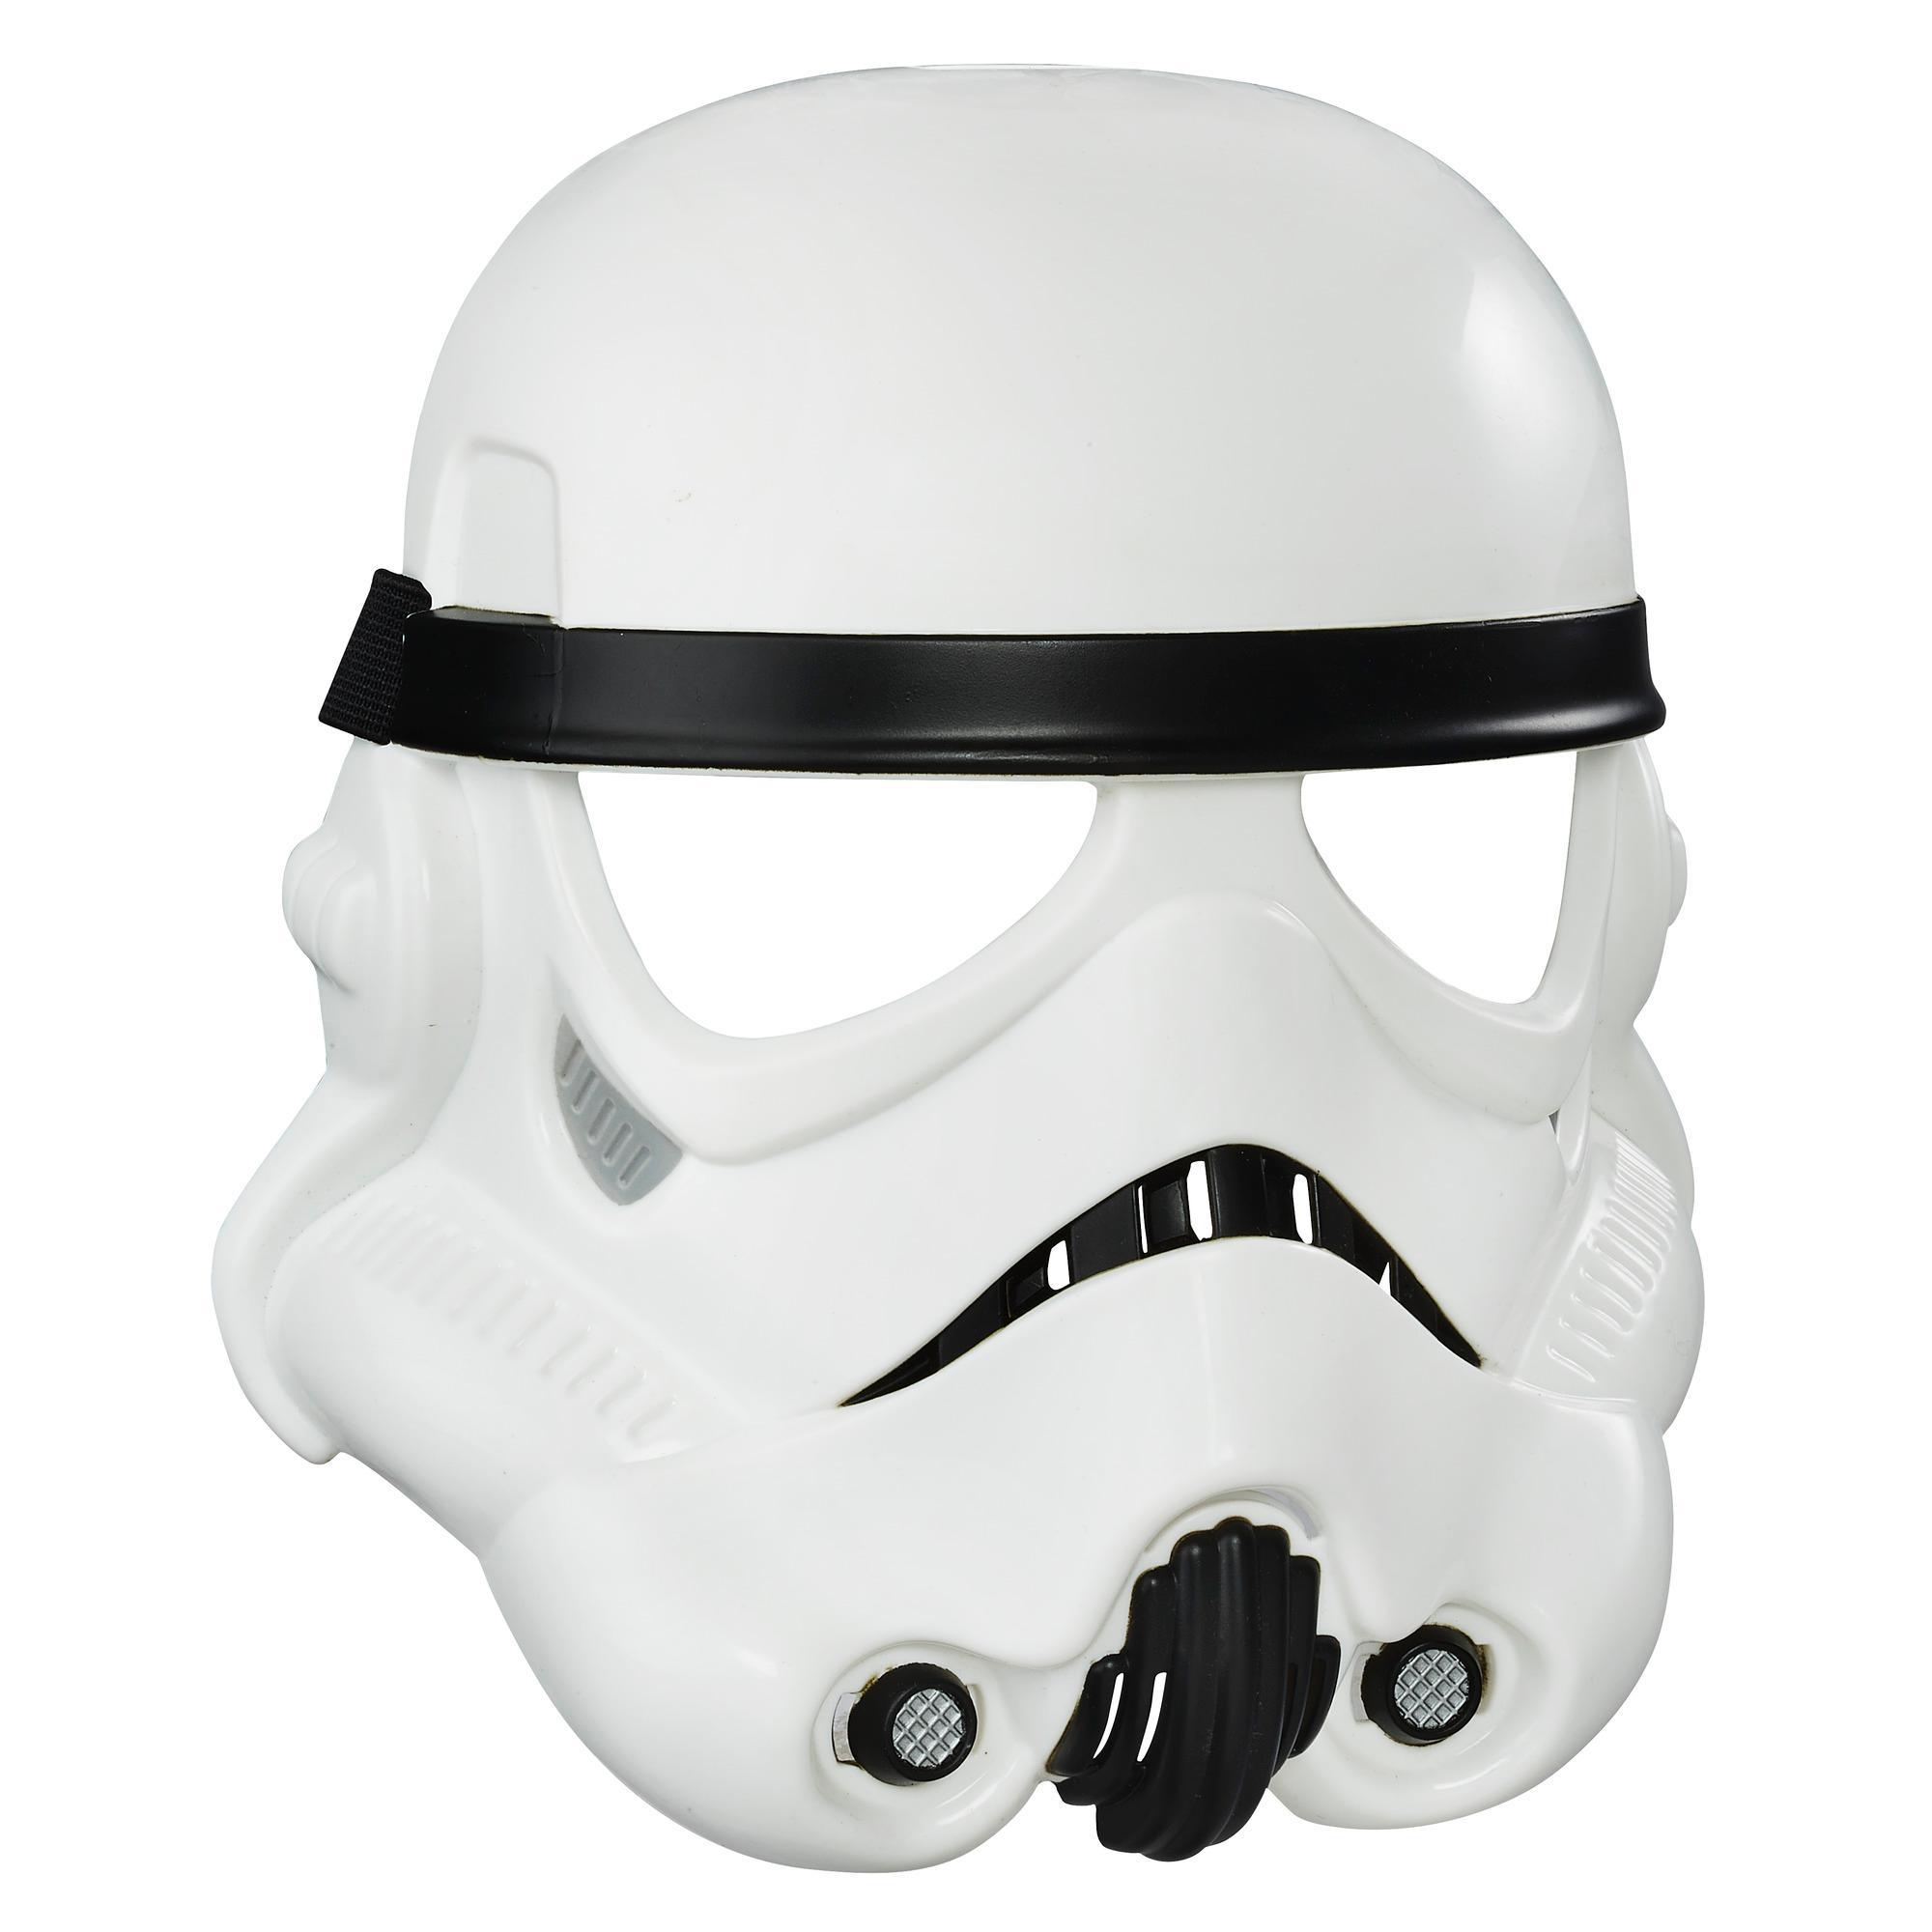 Star Wars R1 Imperial Stormtrooper